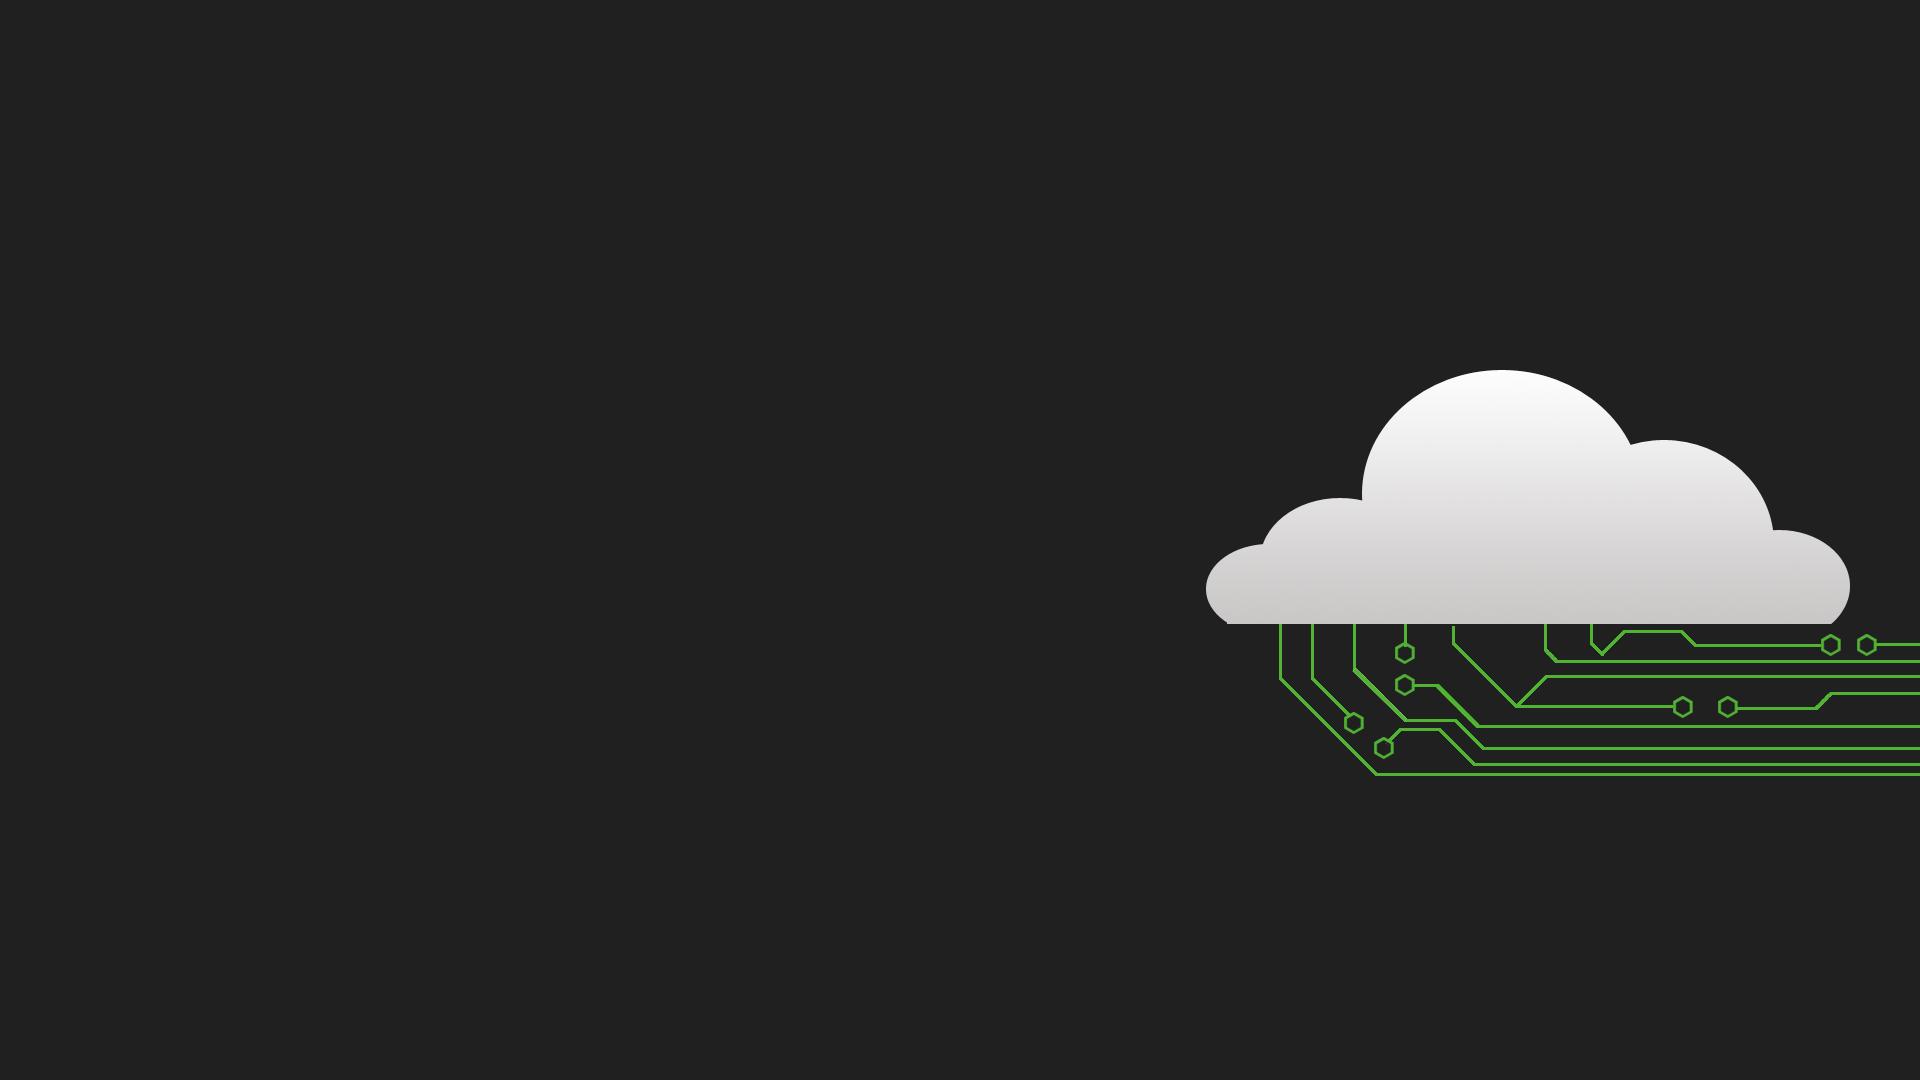 Technology Background Laptop: Minimalism Technology Cloud, HD Artist, 4k Wallpapers